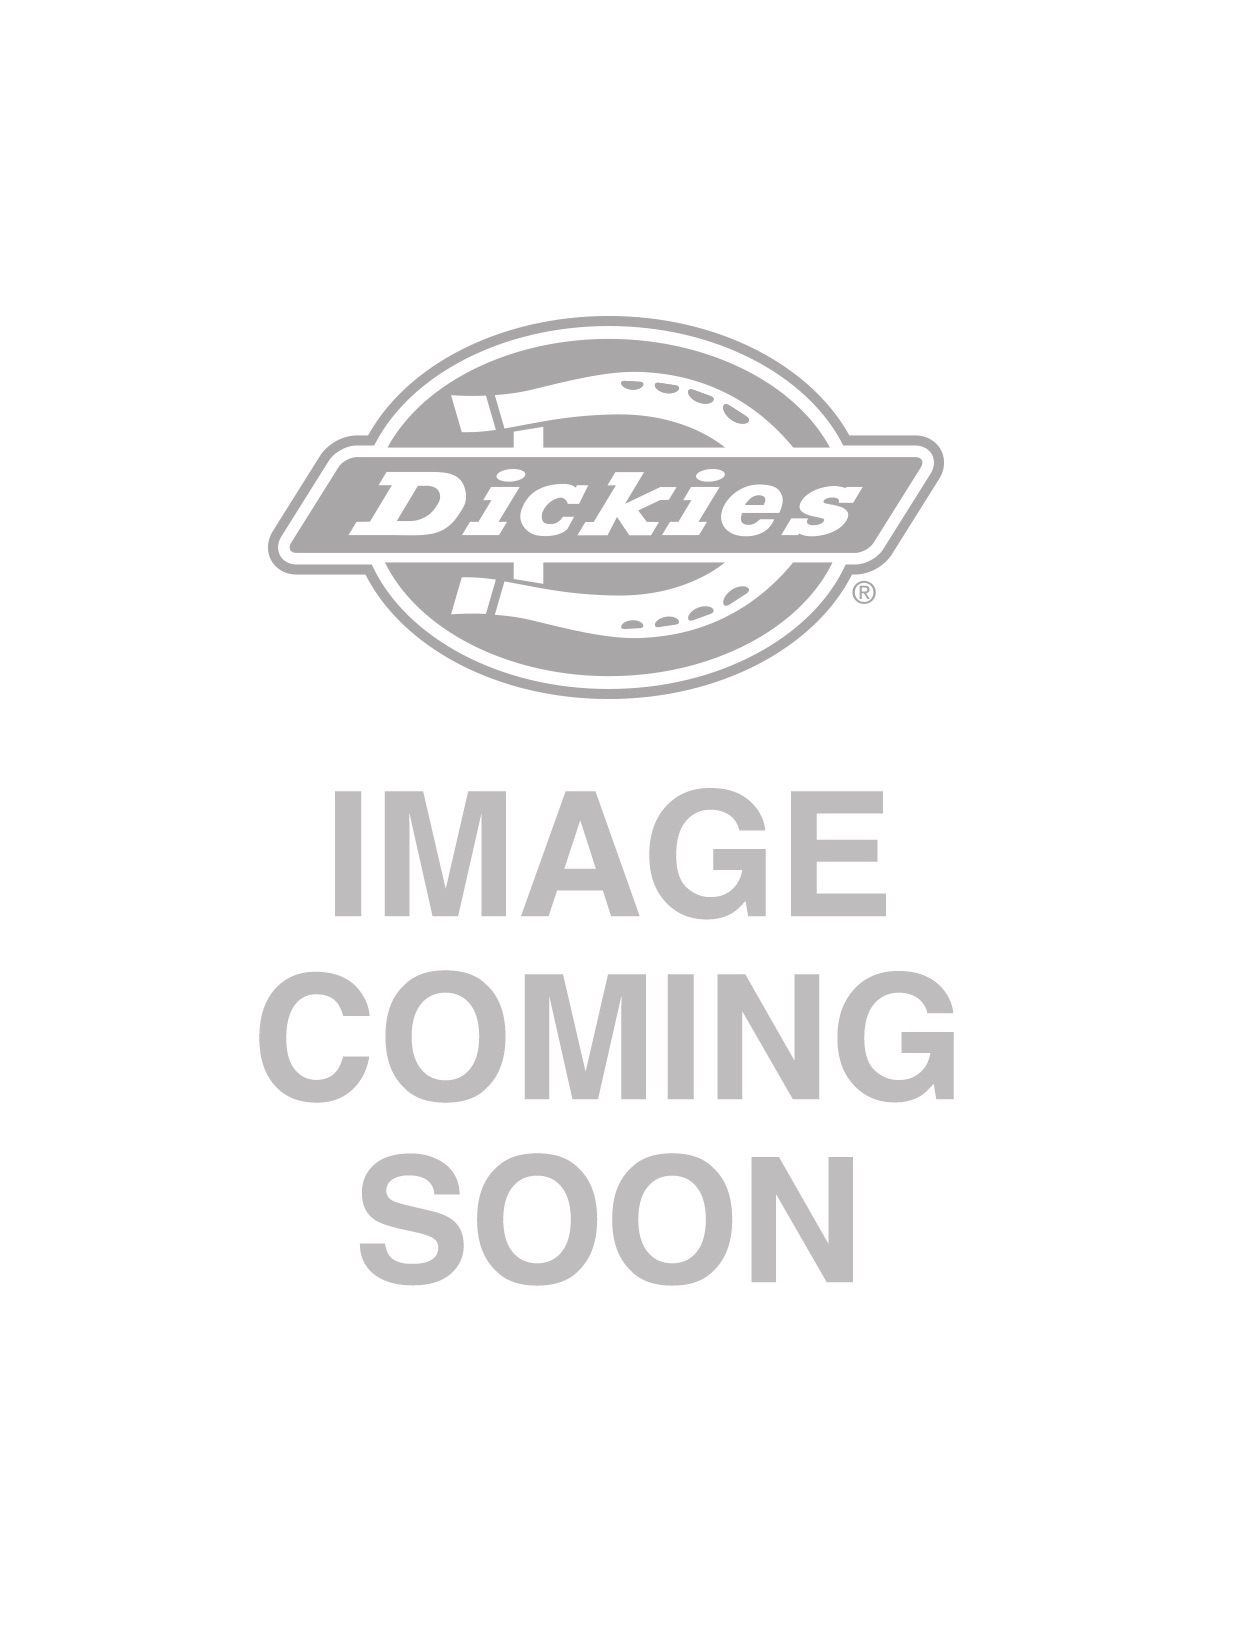 Dickies Long Sleeve Canmer Polo Shirt